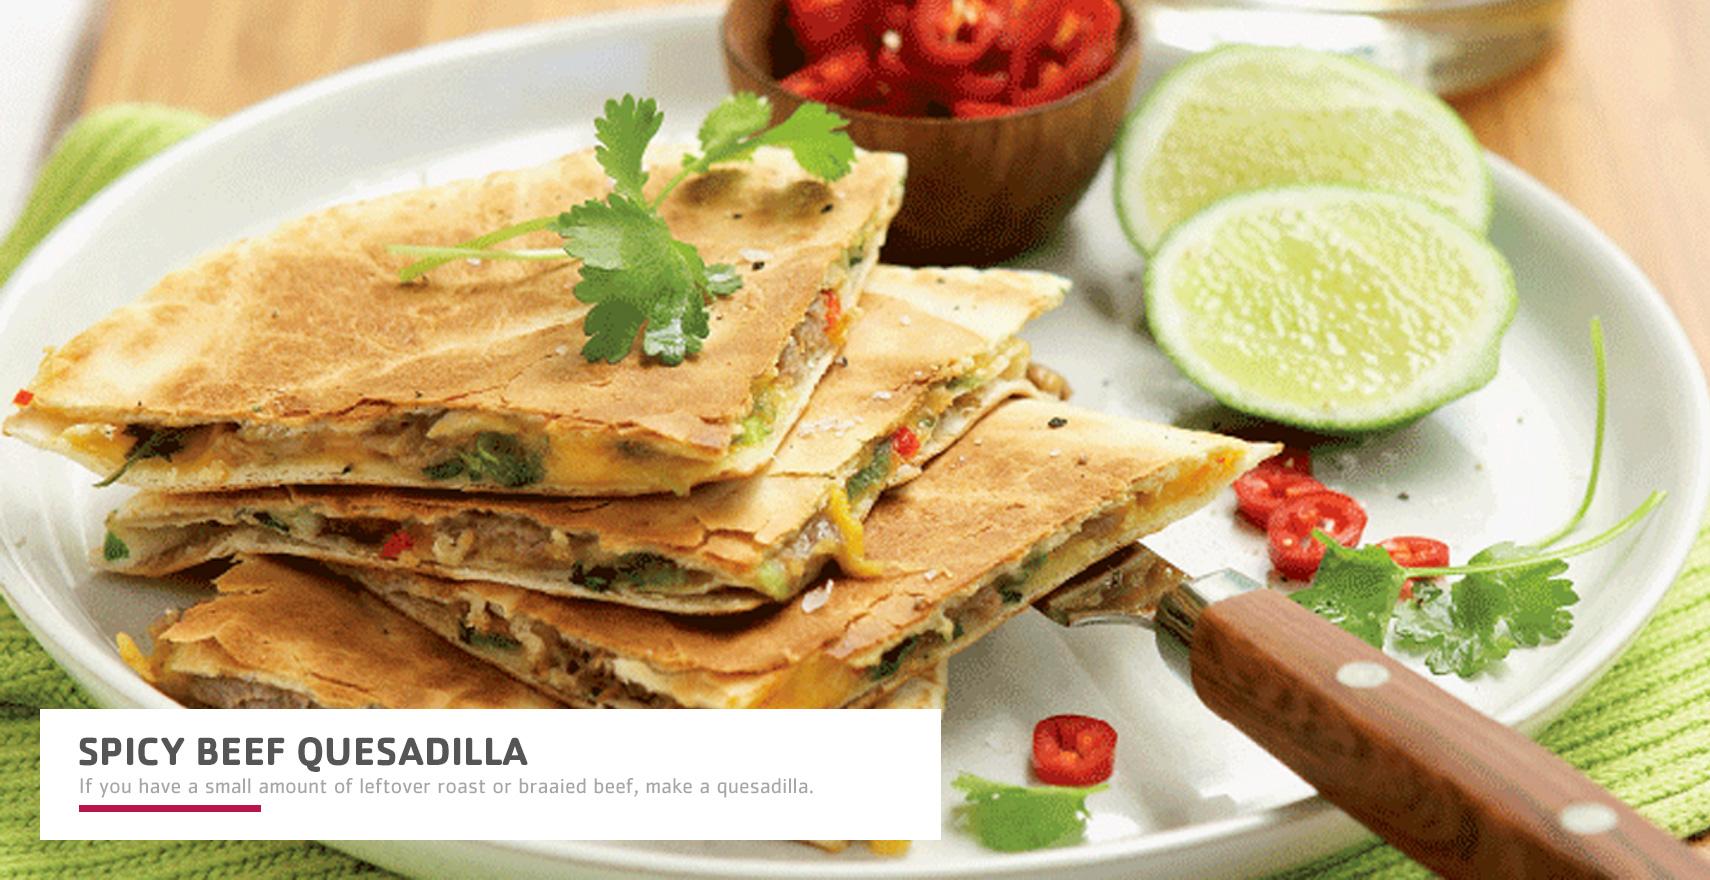 spicy-beef-quesadilla.jpg